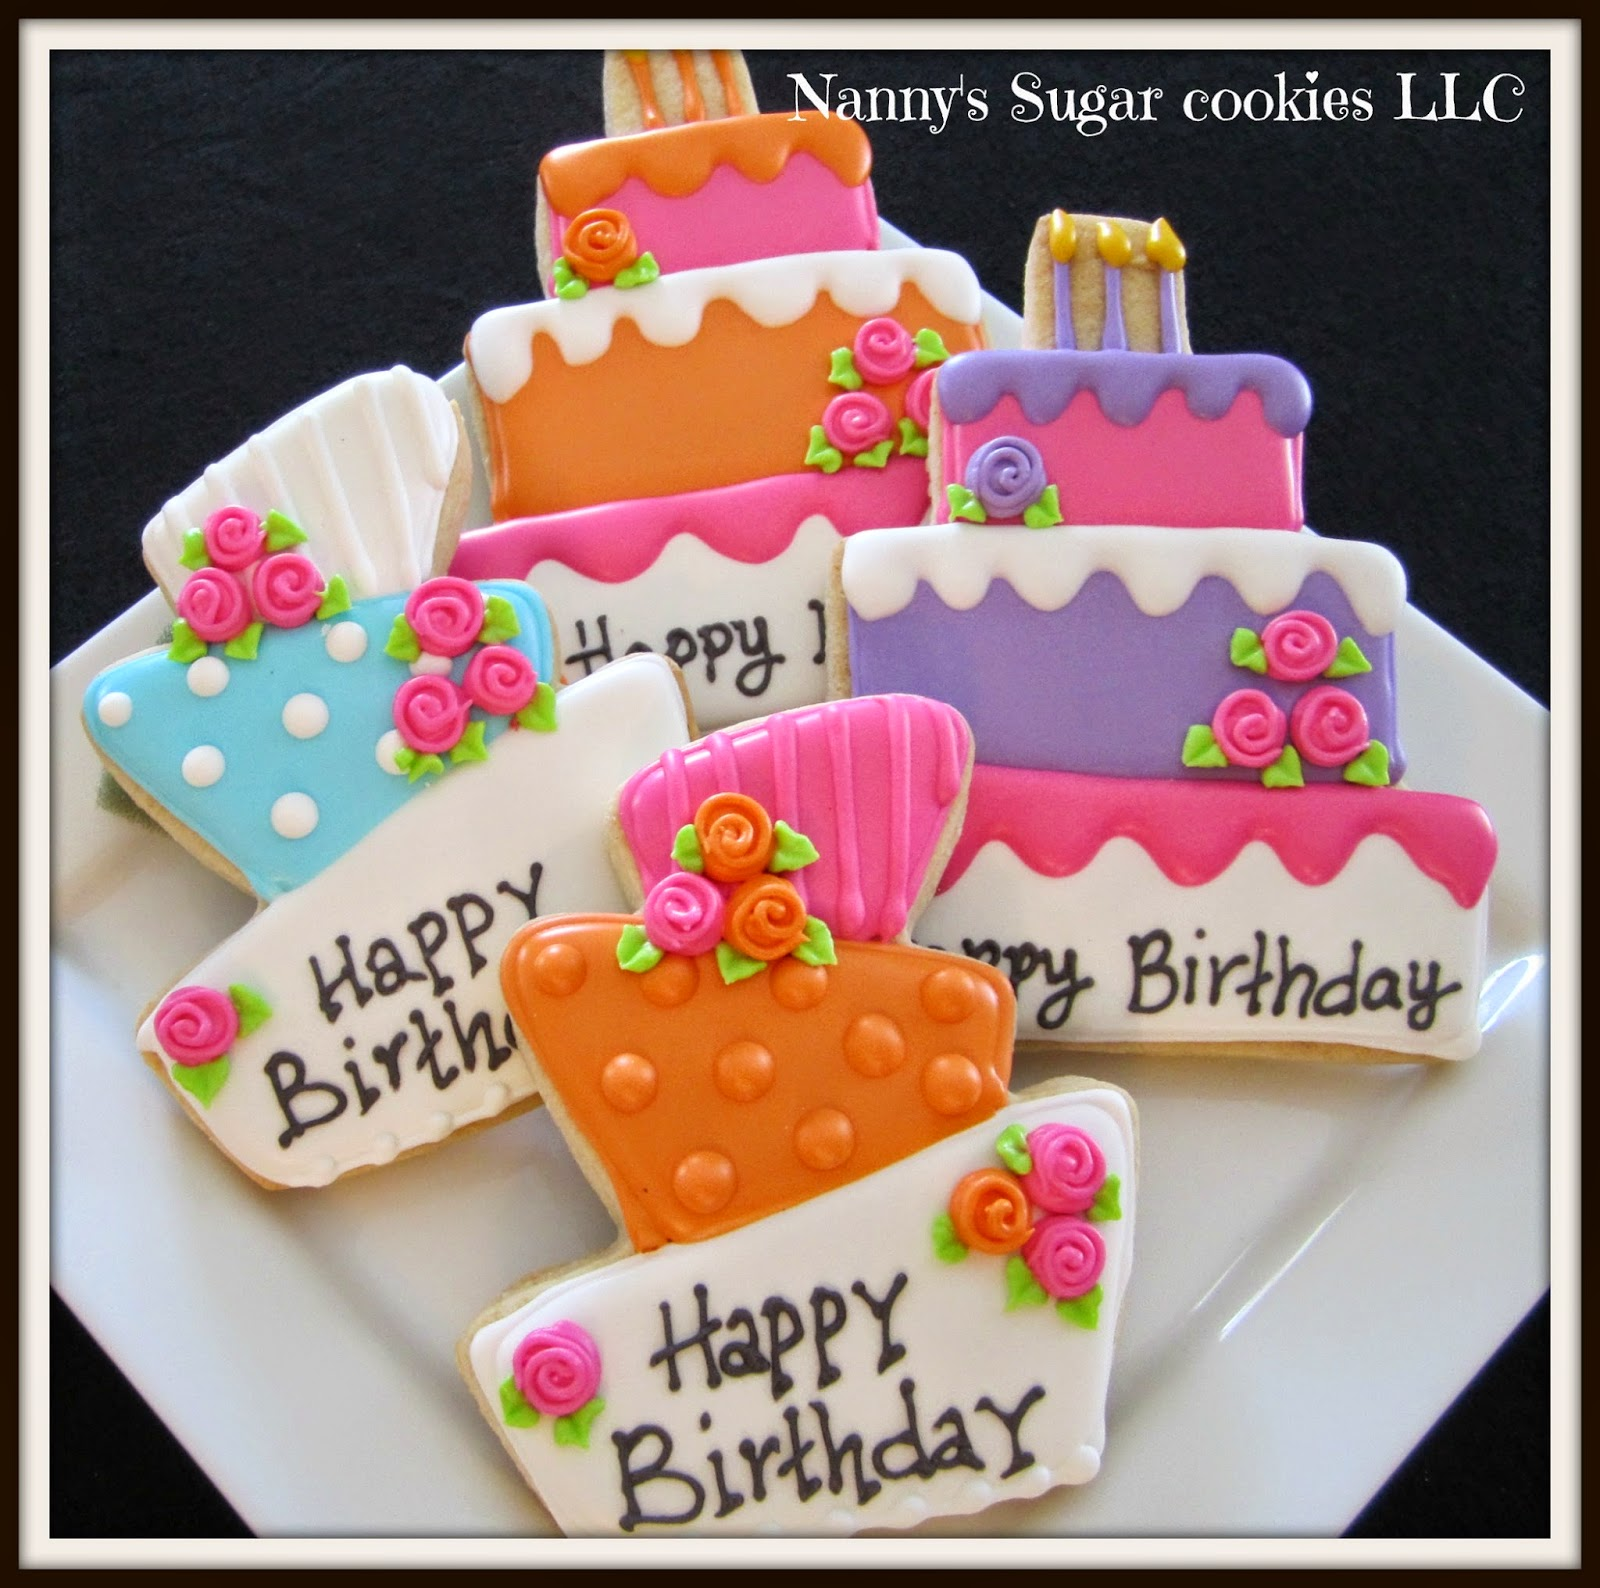 Nanny's Sugar Cookies LLC: Happy Birthday To You